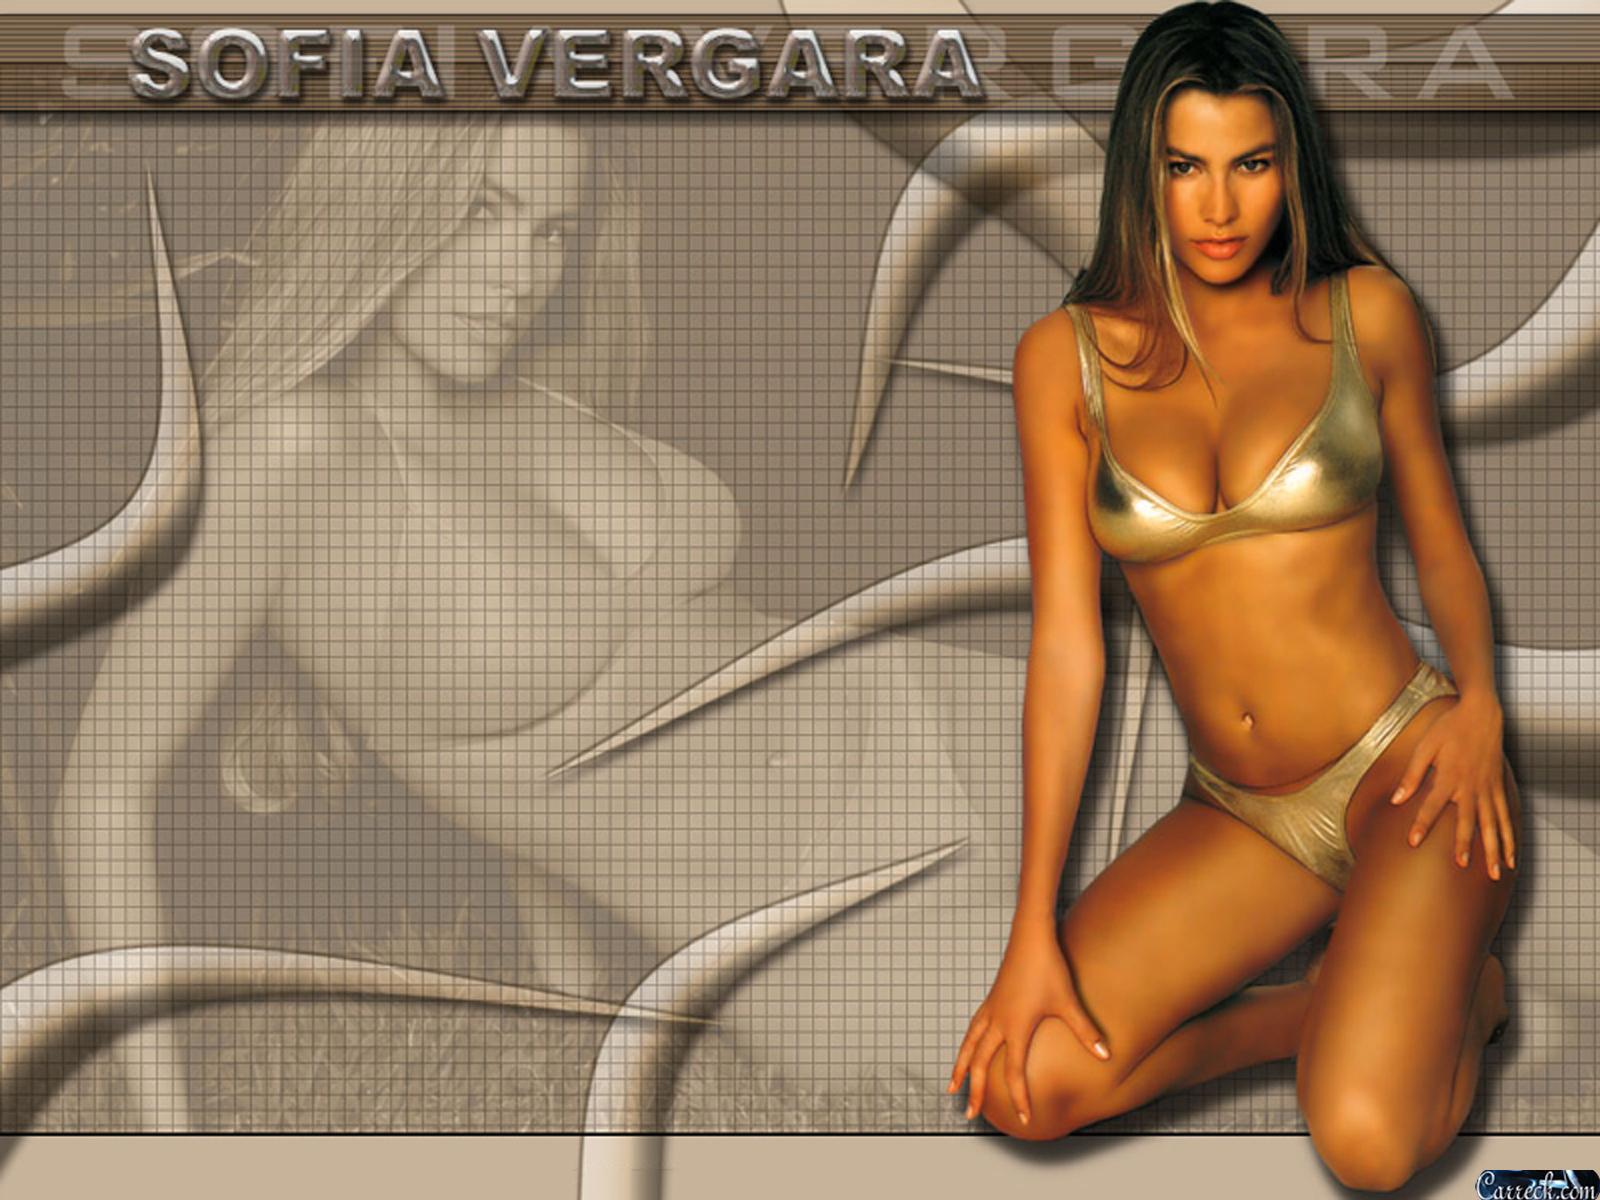 Sofa Vergara   Sofa Vergara Wallpaper 20737723 1600x1200